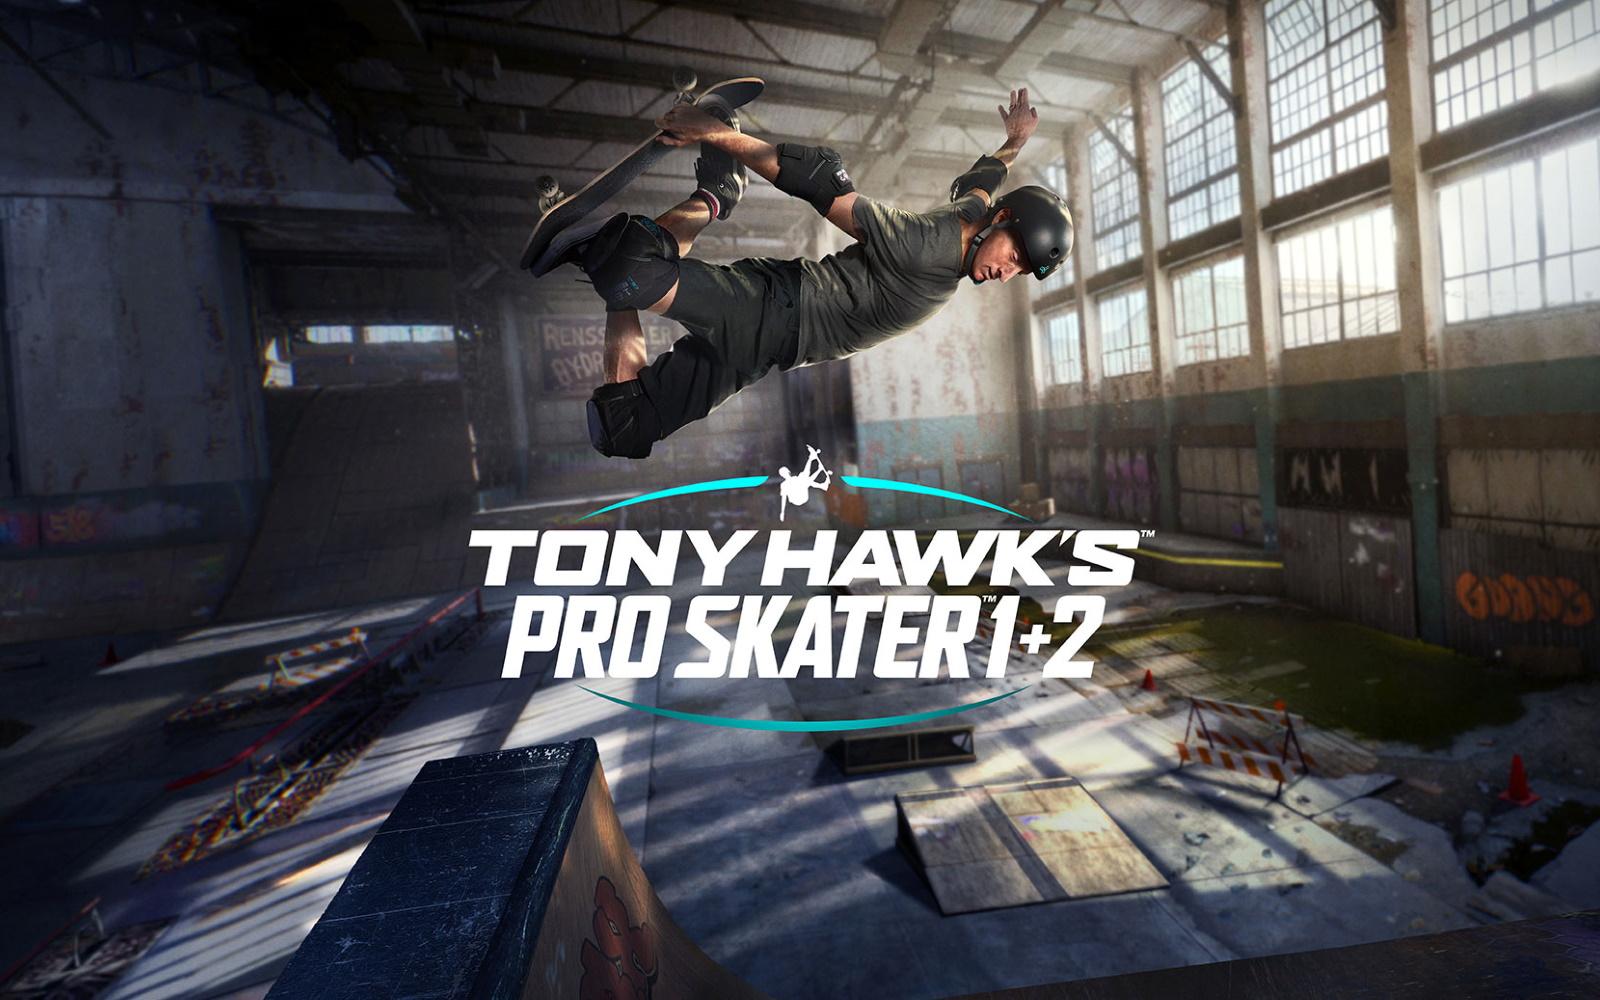 Tony Hawk Pro Skater 1 & 2 Coming In September